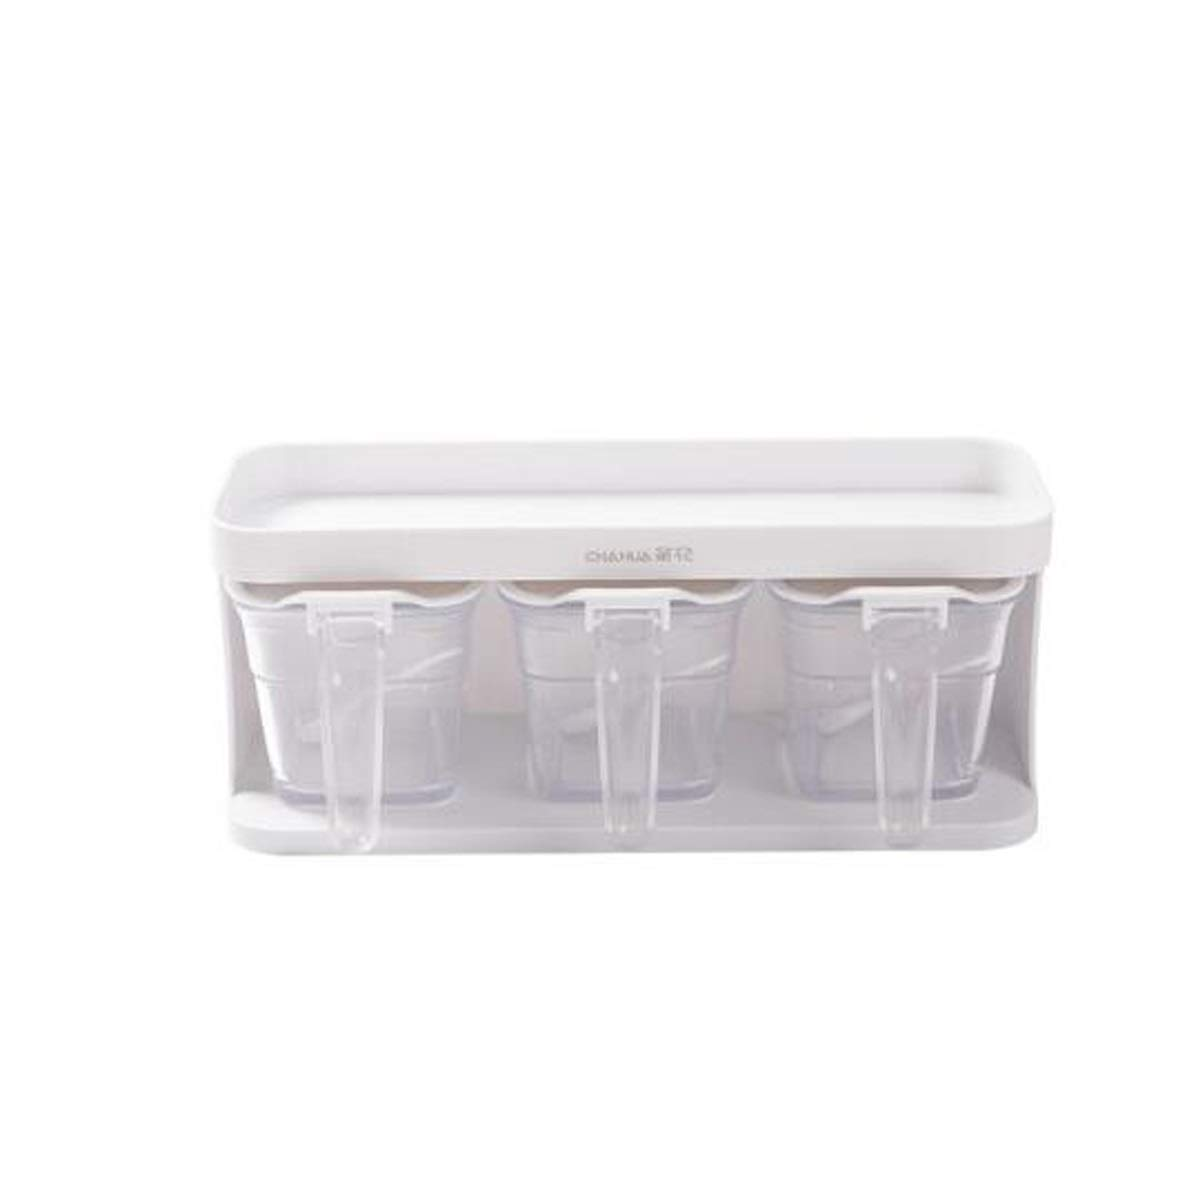 MINGRUIGONGMAO Three sets of seasoning jars, kitchen racks, seasoning boxes, seasoning bottles, pressed seasoning boxes, white Plush toys (Color : White, Size : 3) by MINGRUIGONGMAO